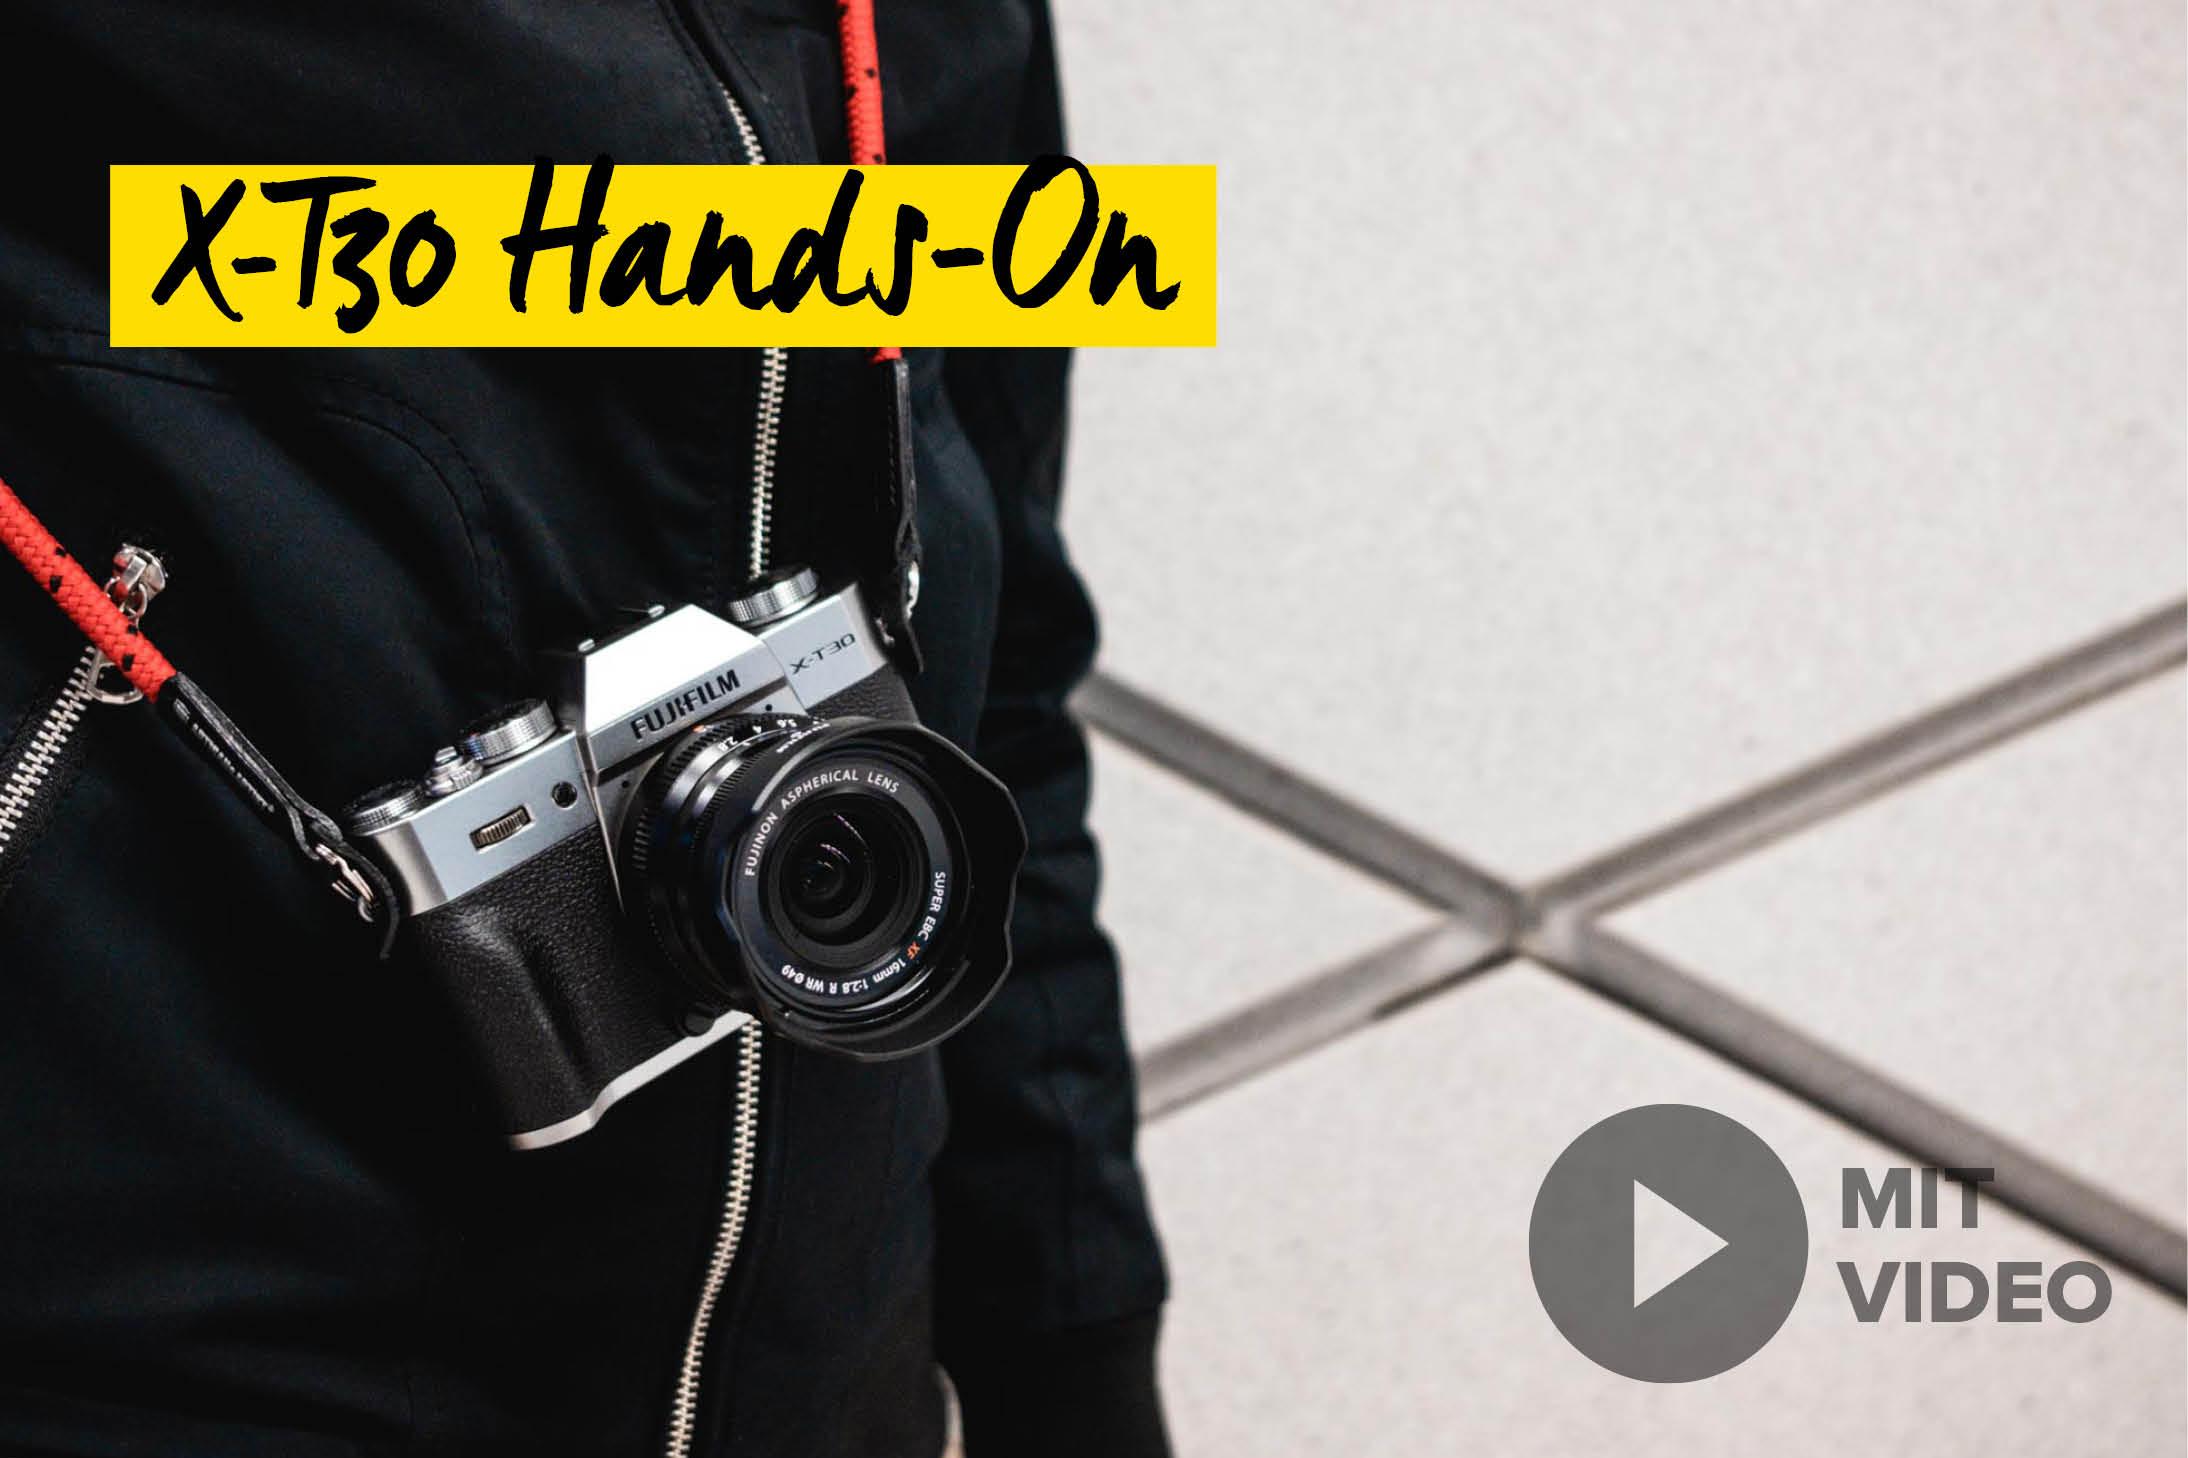 Fujifilm X-T20 vs X-T30 - lohnt sich die dritte Ge